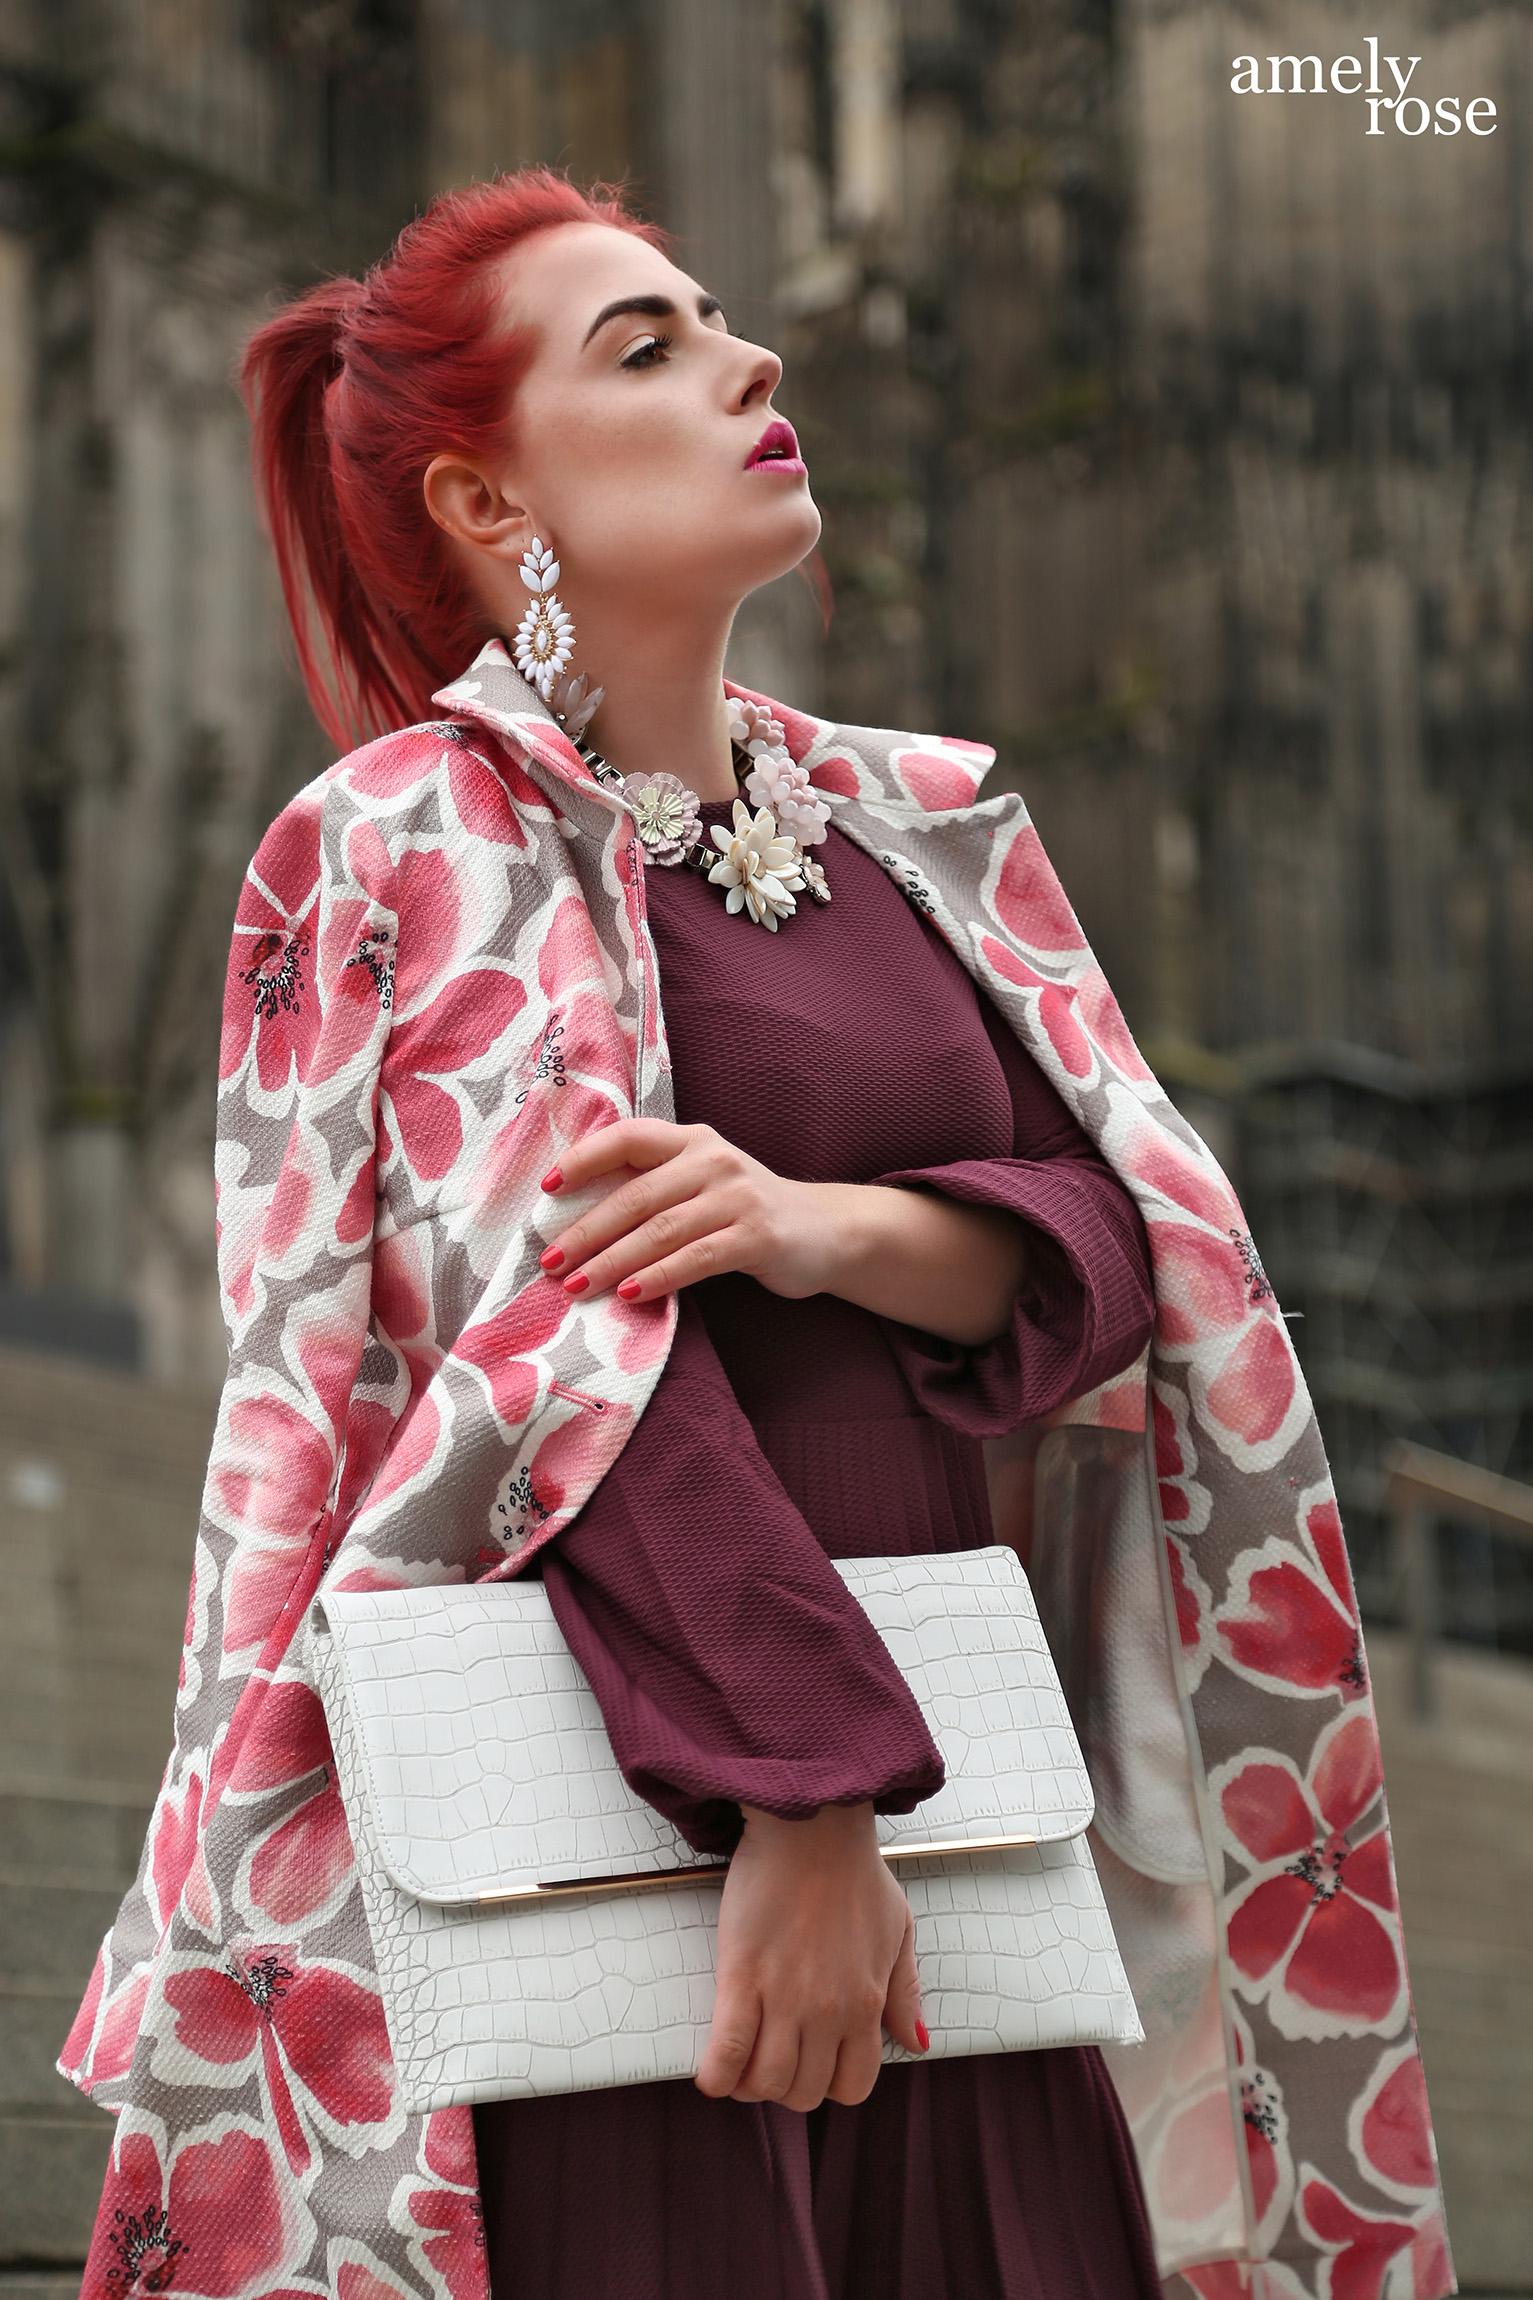 amelyrose, amely, rose, amely_rose, redhead, redhair, red_hair-cologne, cgn, koeln, koelnerdom,